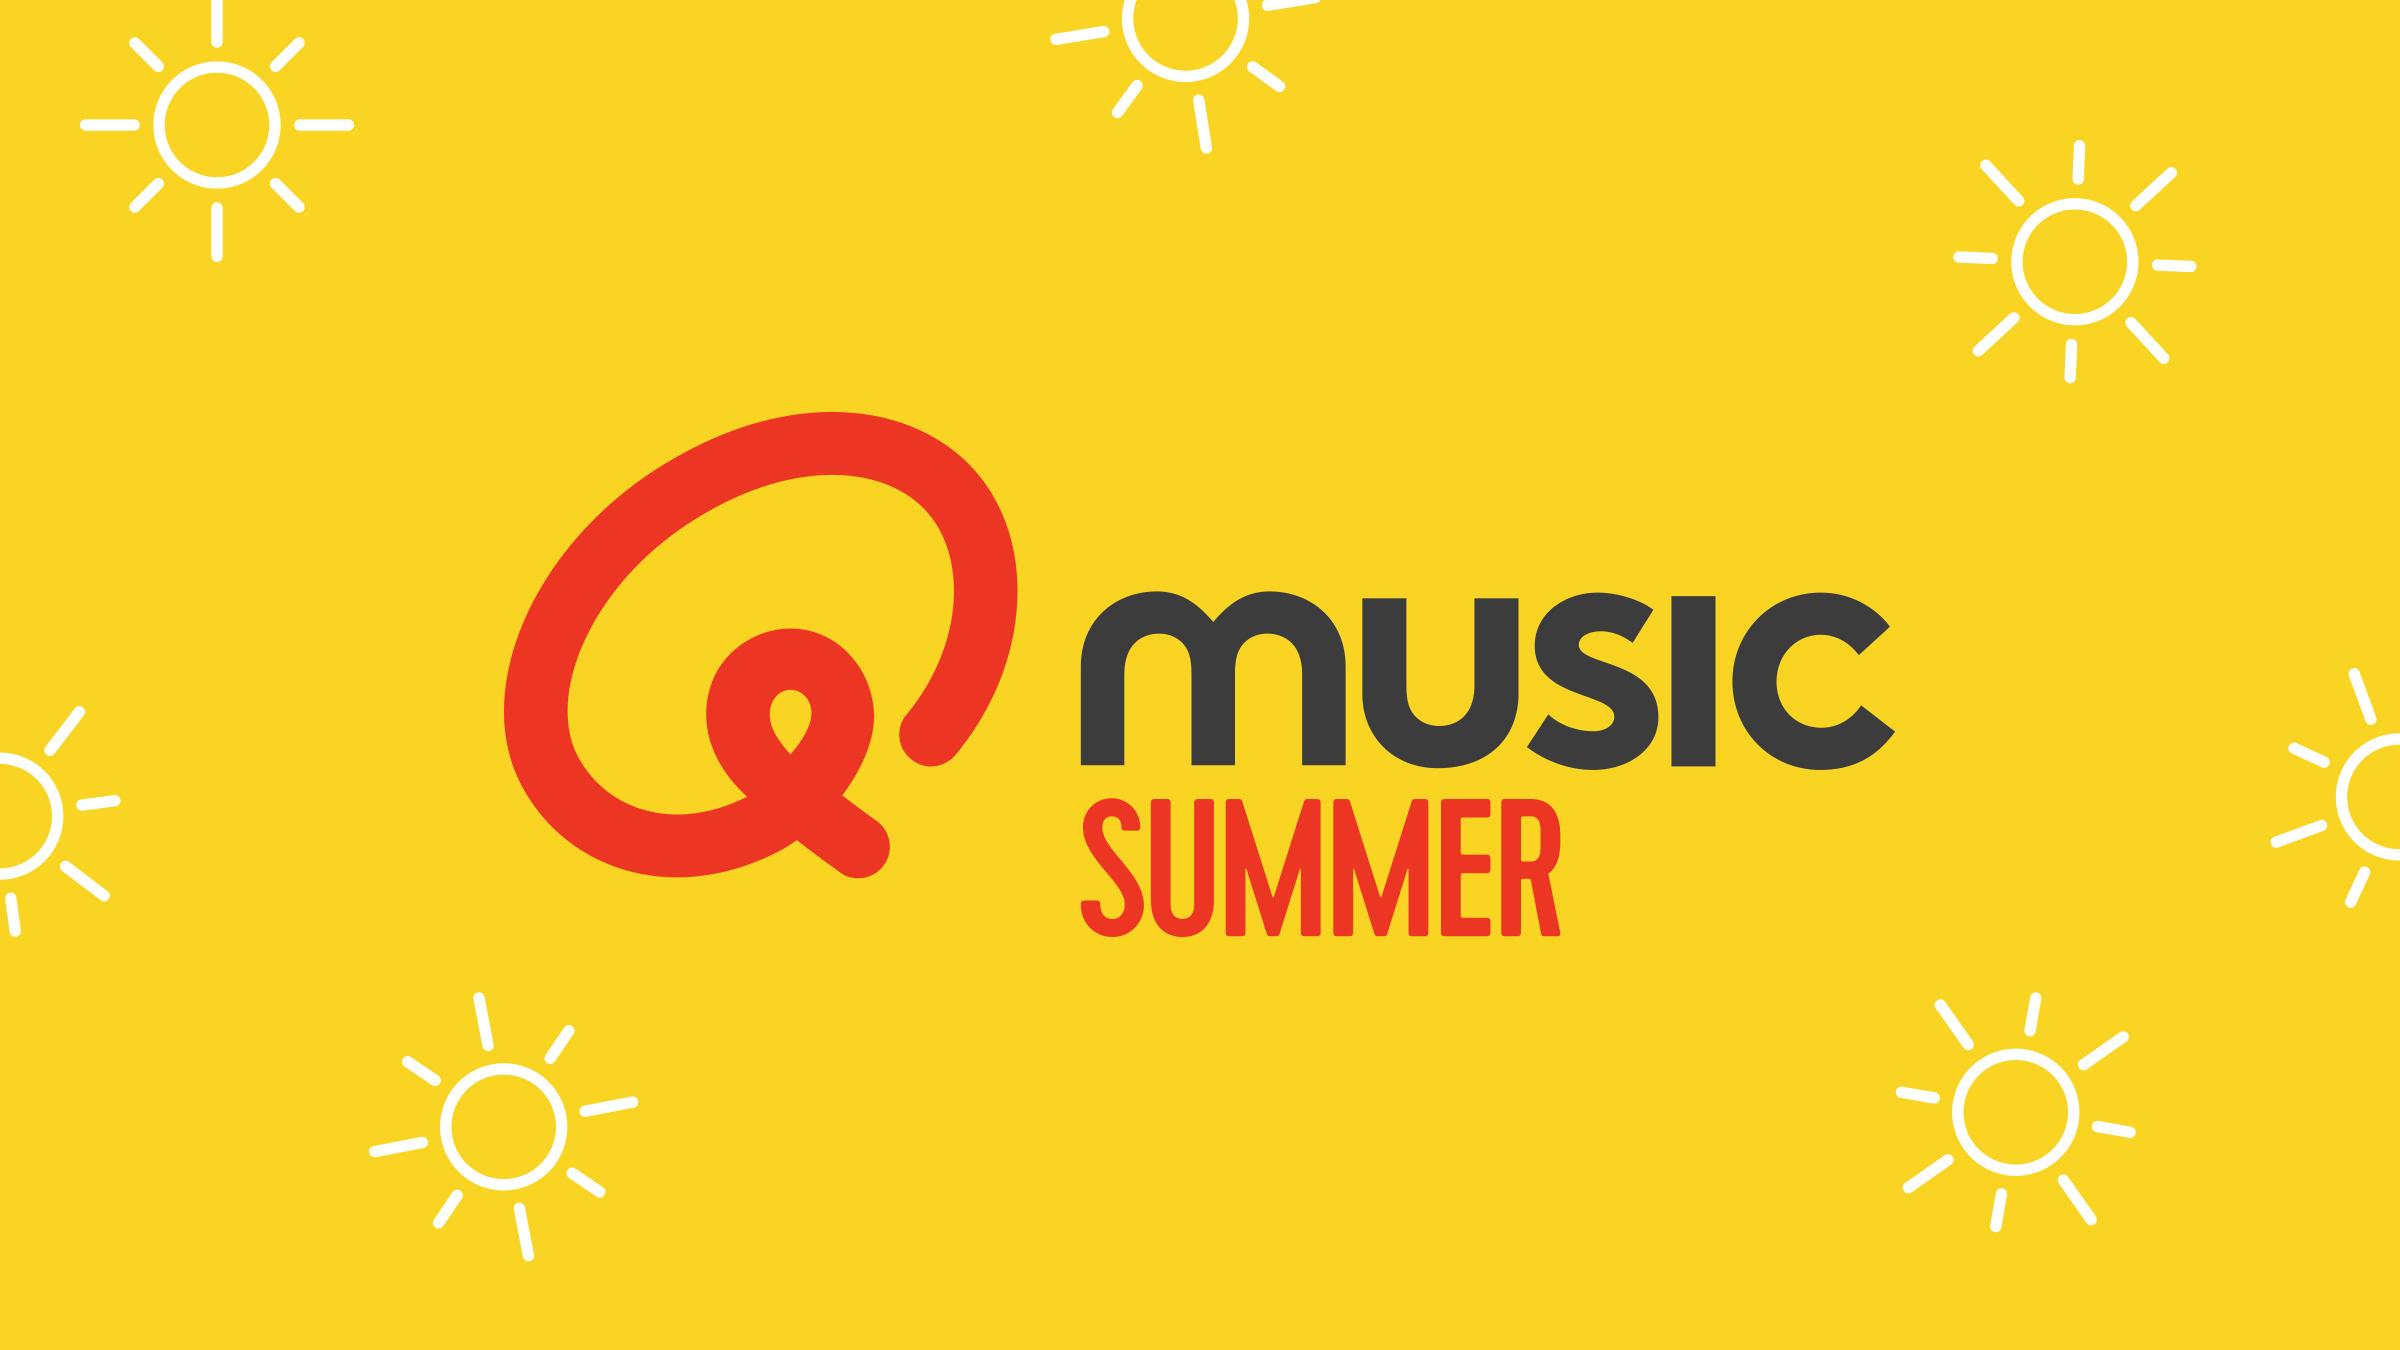 Qmusic teaser summer